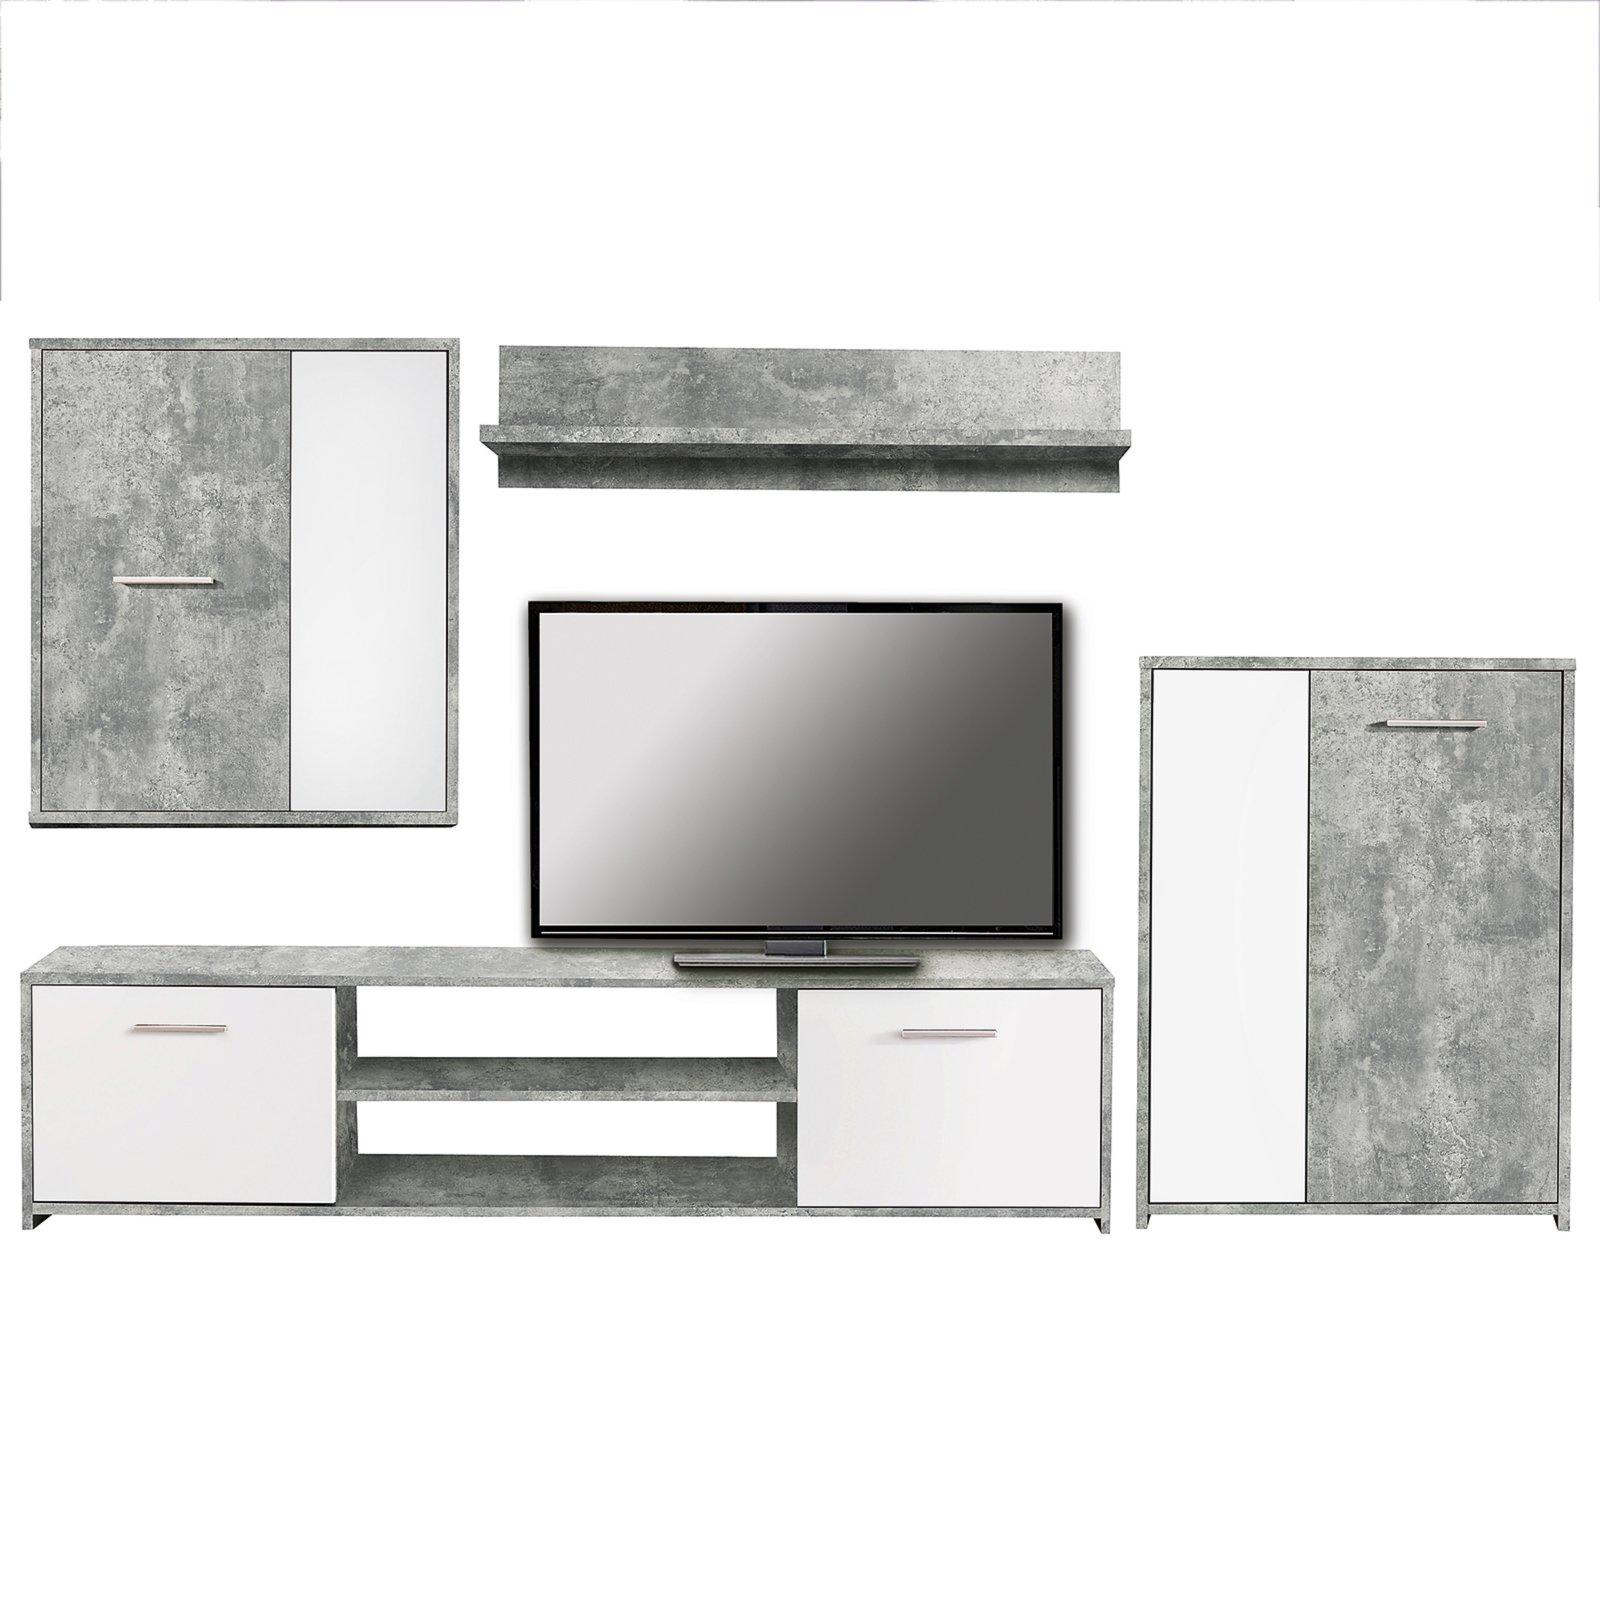 set paco wohnwand beton optik wei 4 teilig wohnw nde m bel roller m belhaus. Black Bedroom Furniture Sets. Home Design Ideas